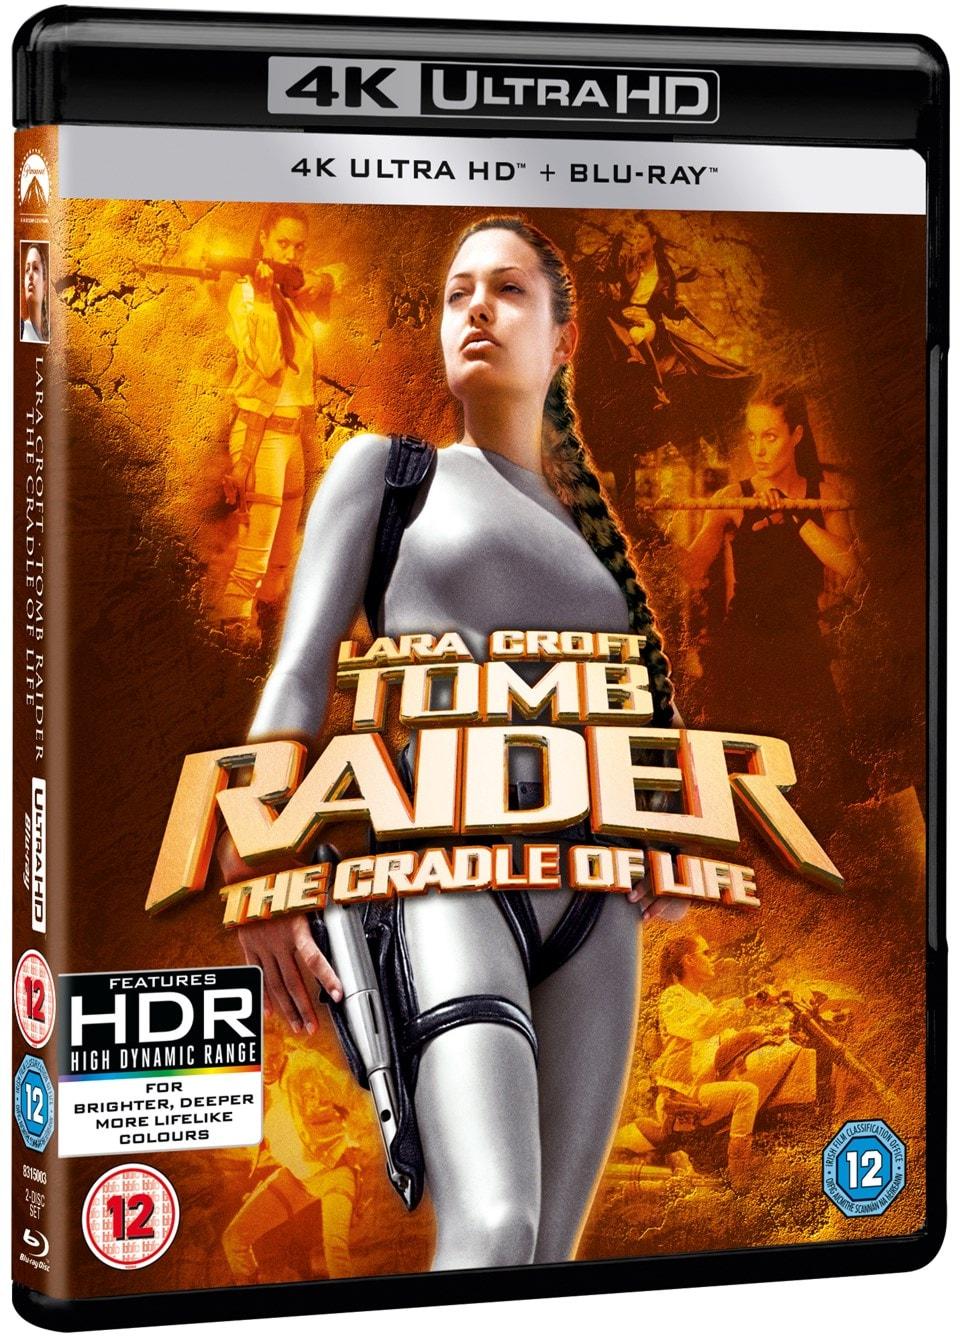 Lara Croft - Tomb Raider: The Cradle of Life - 2